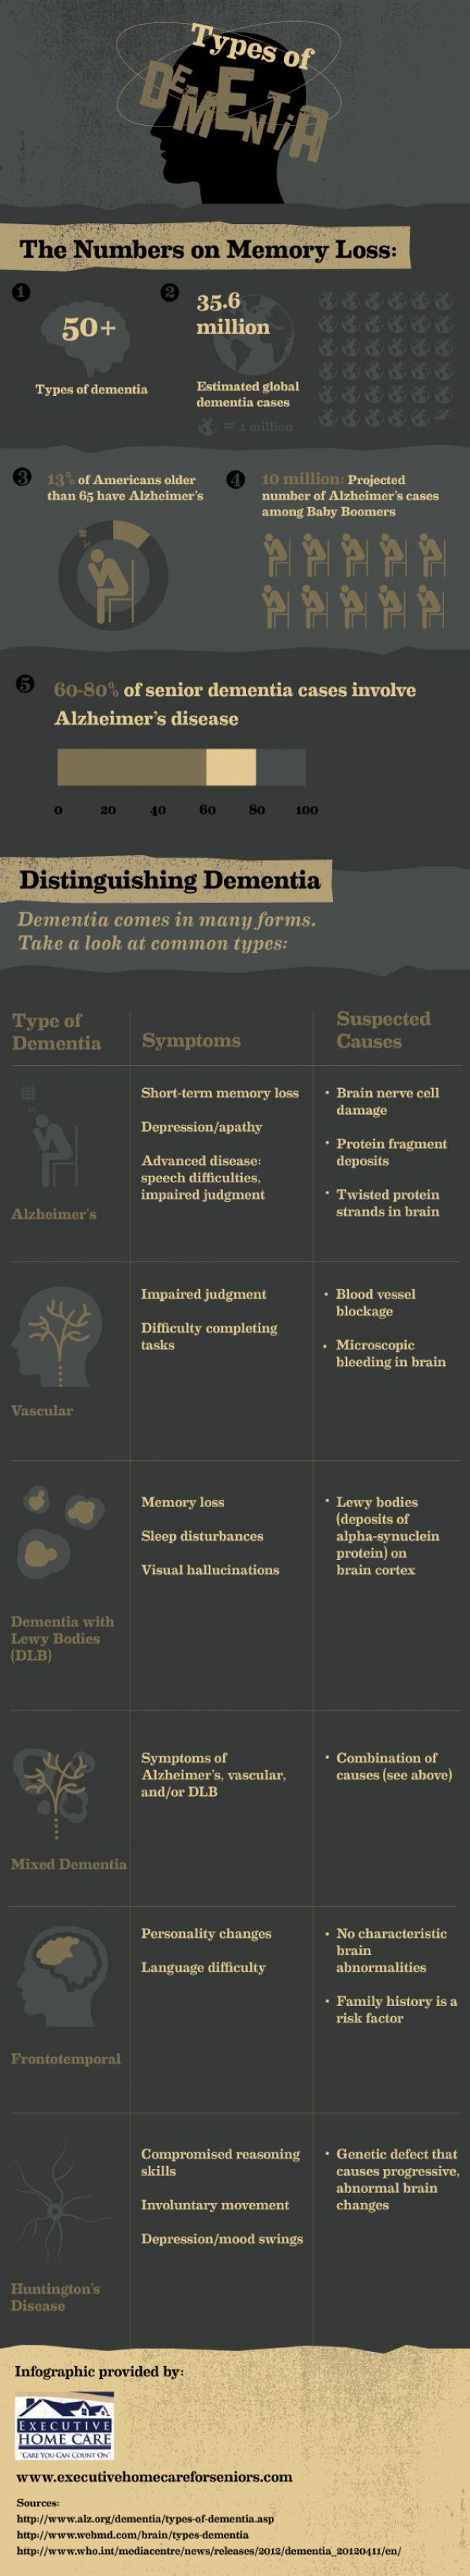 Types of #Dementia #alzheimers